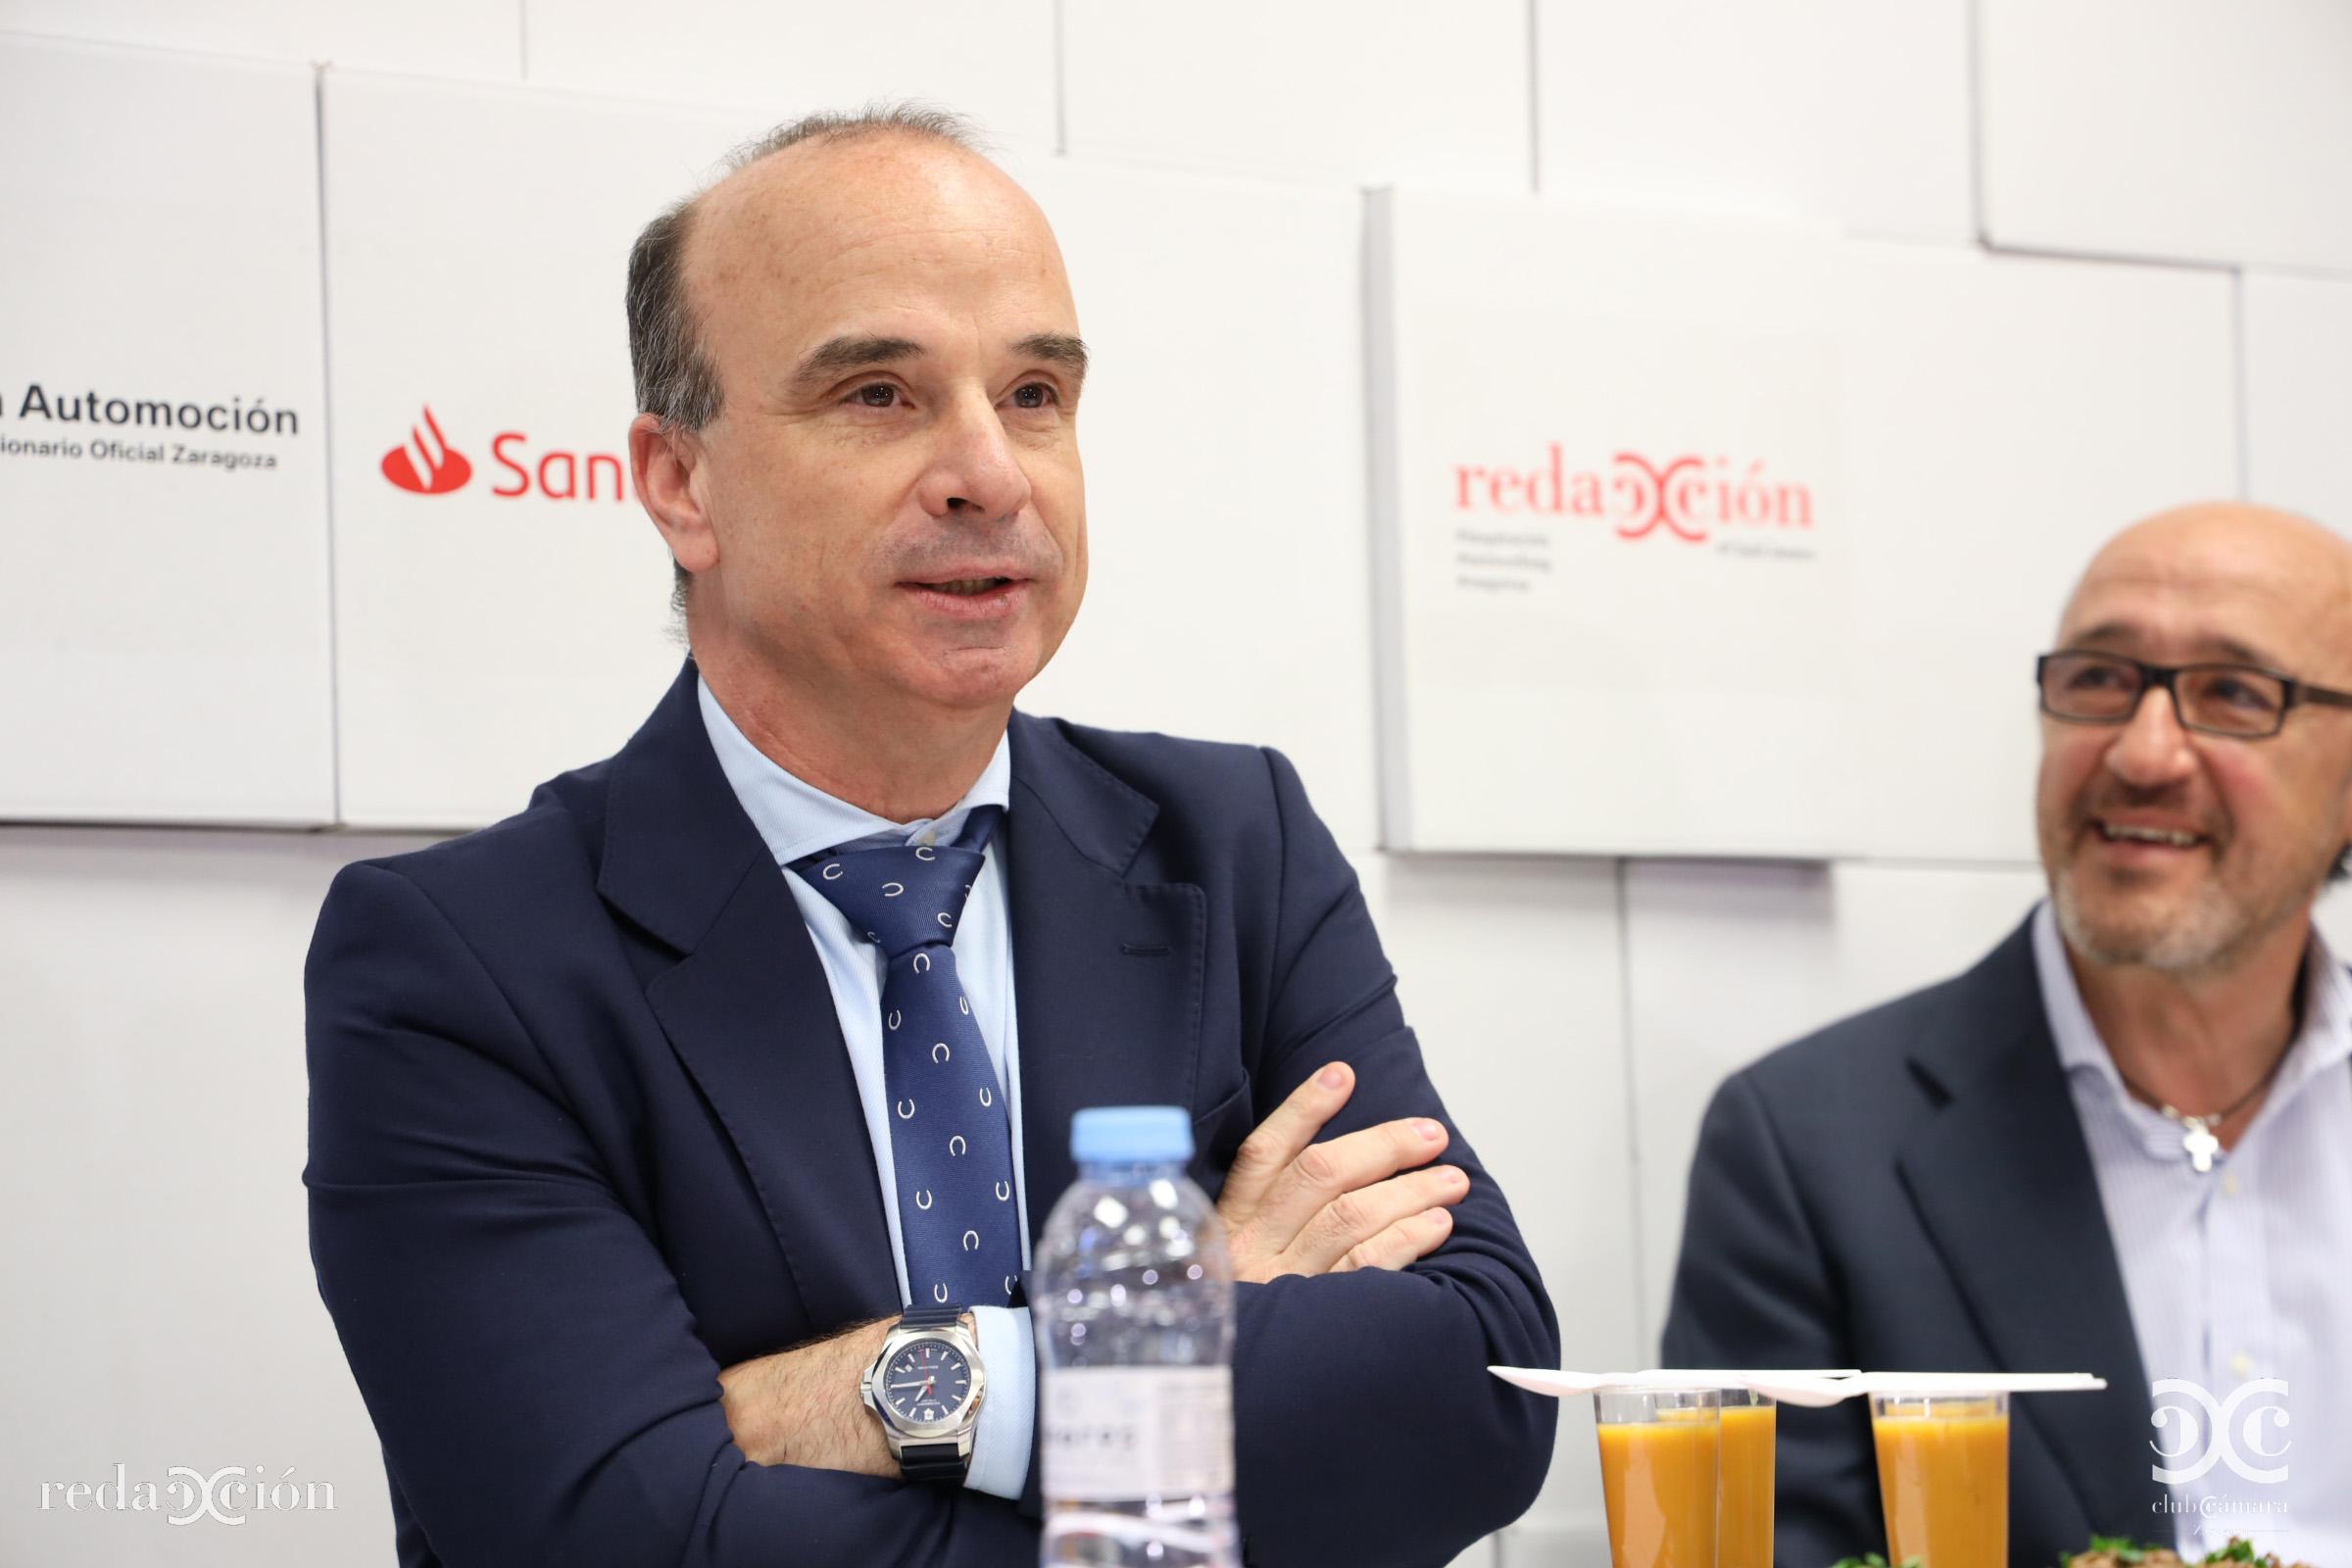 Javier Cendoya, Edelvives